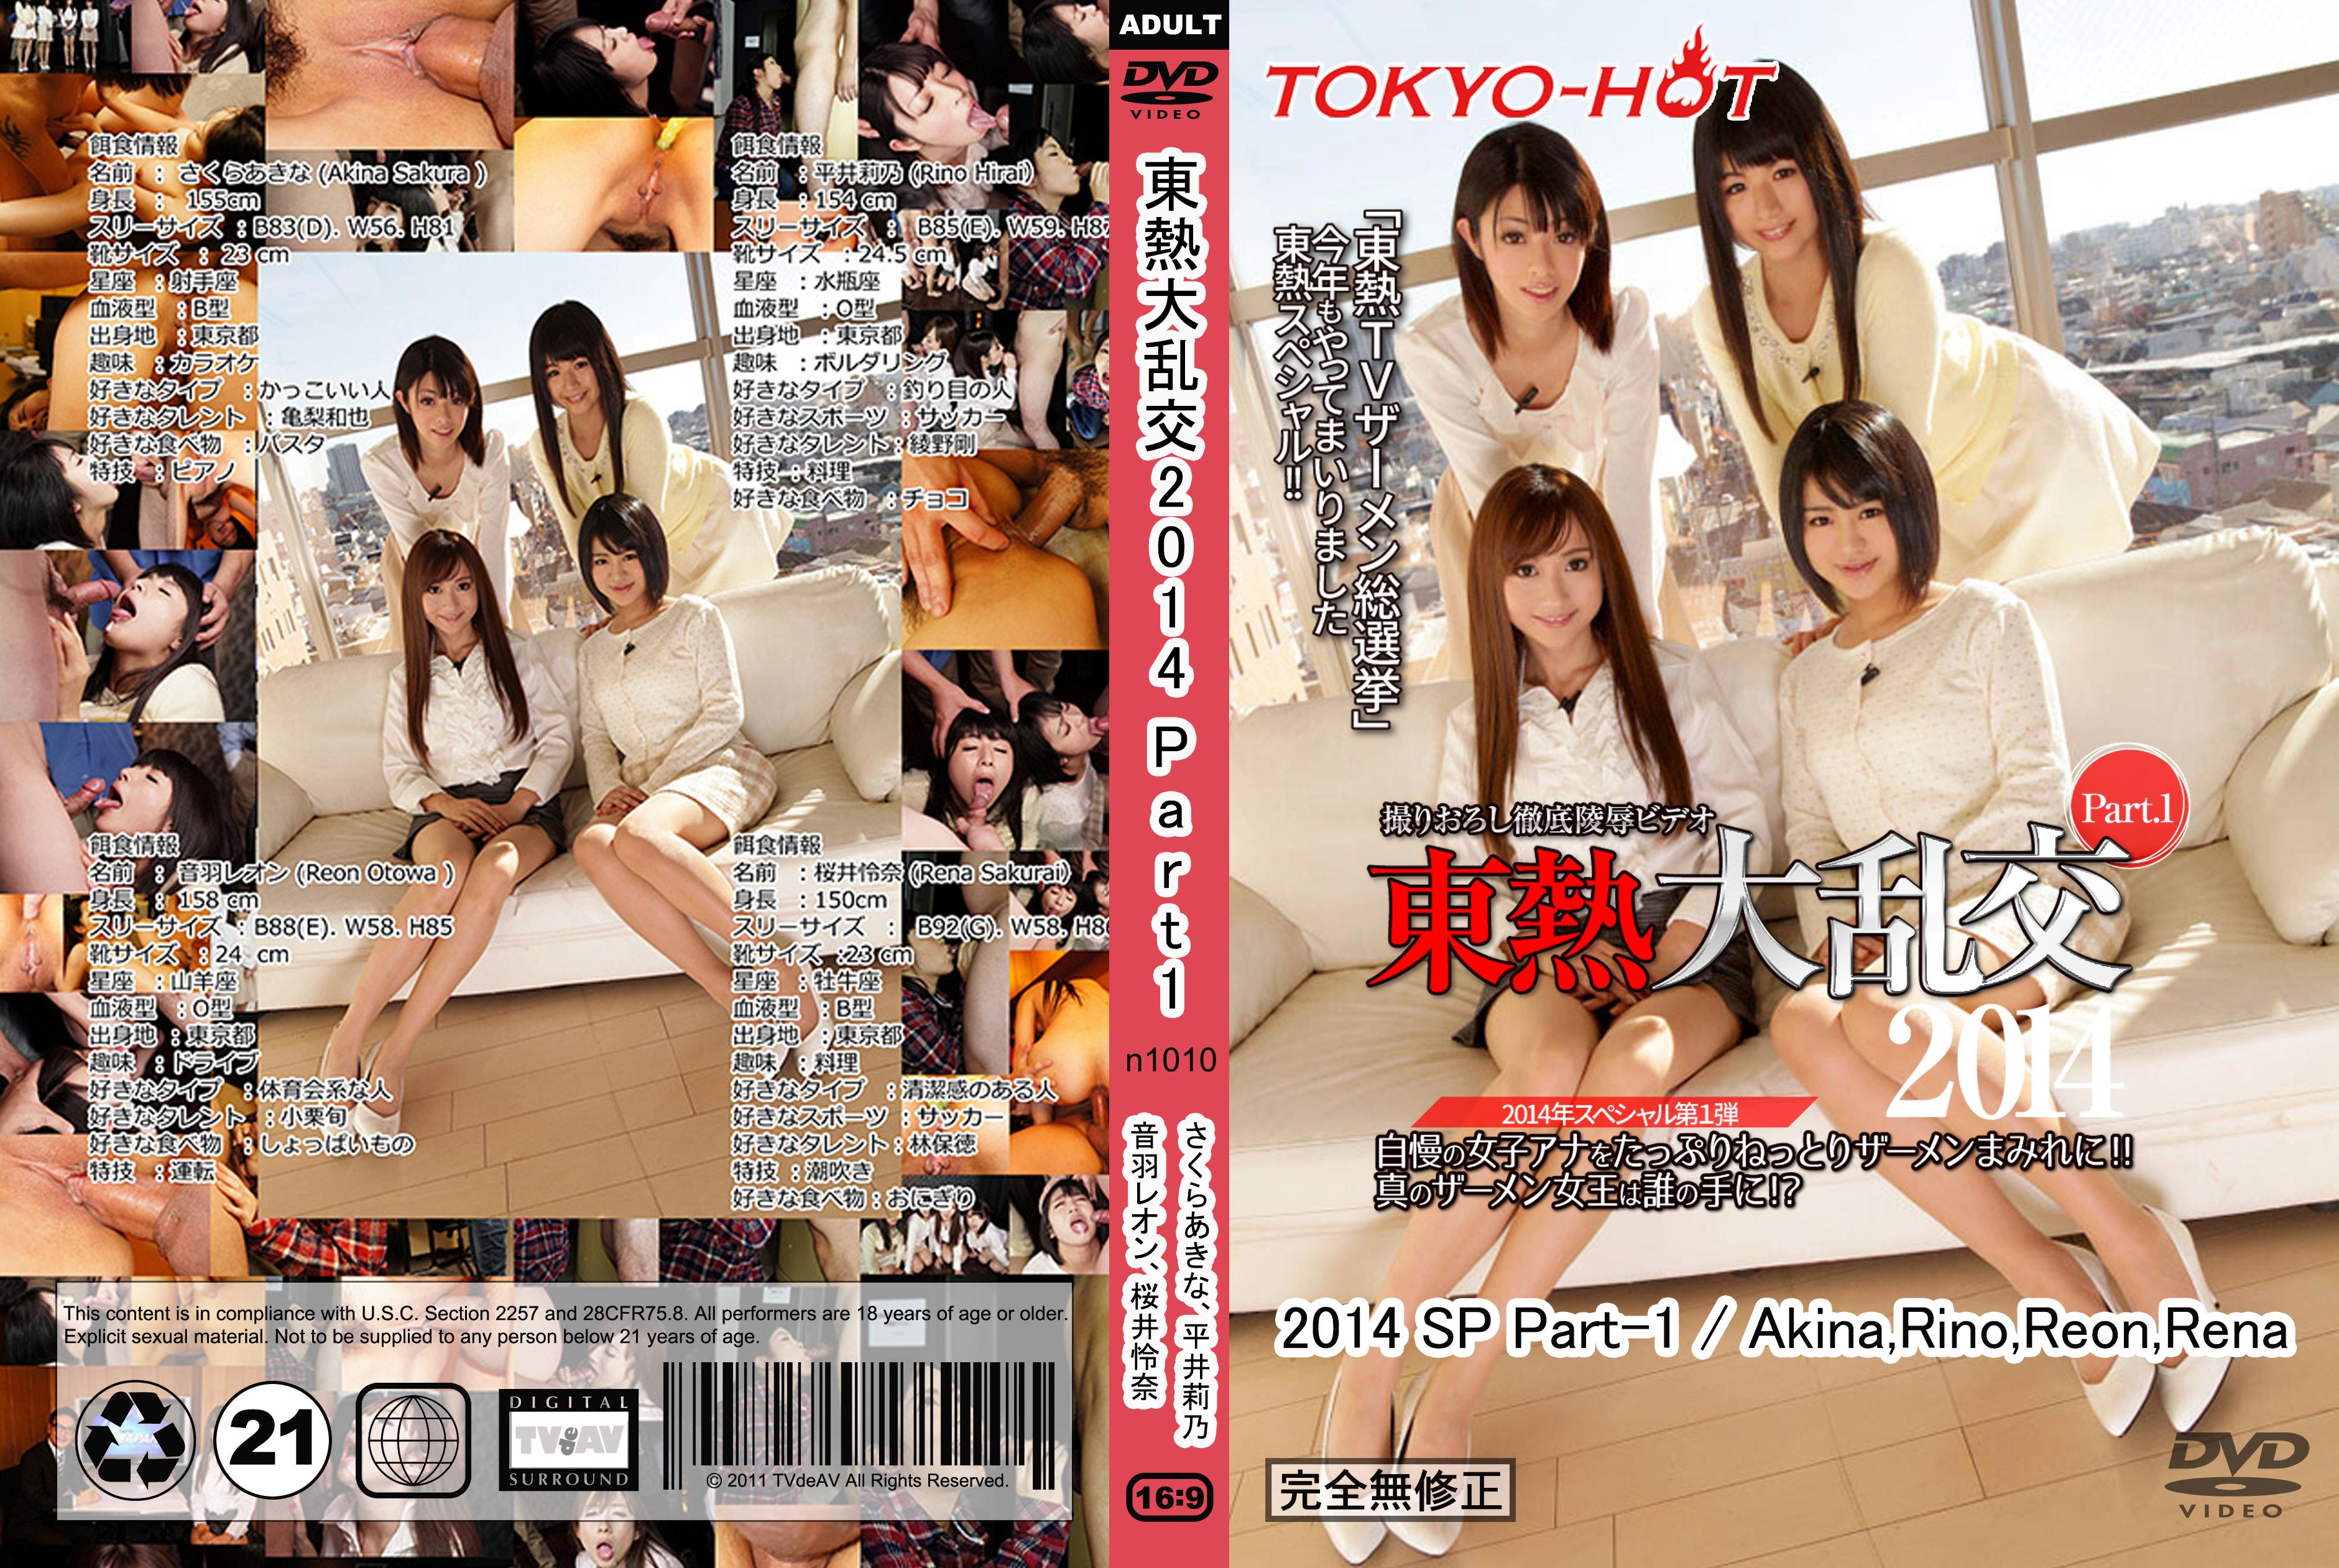 tokyo-hot-n1010-東熱大乱交2014 Part1